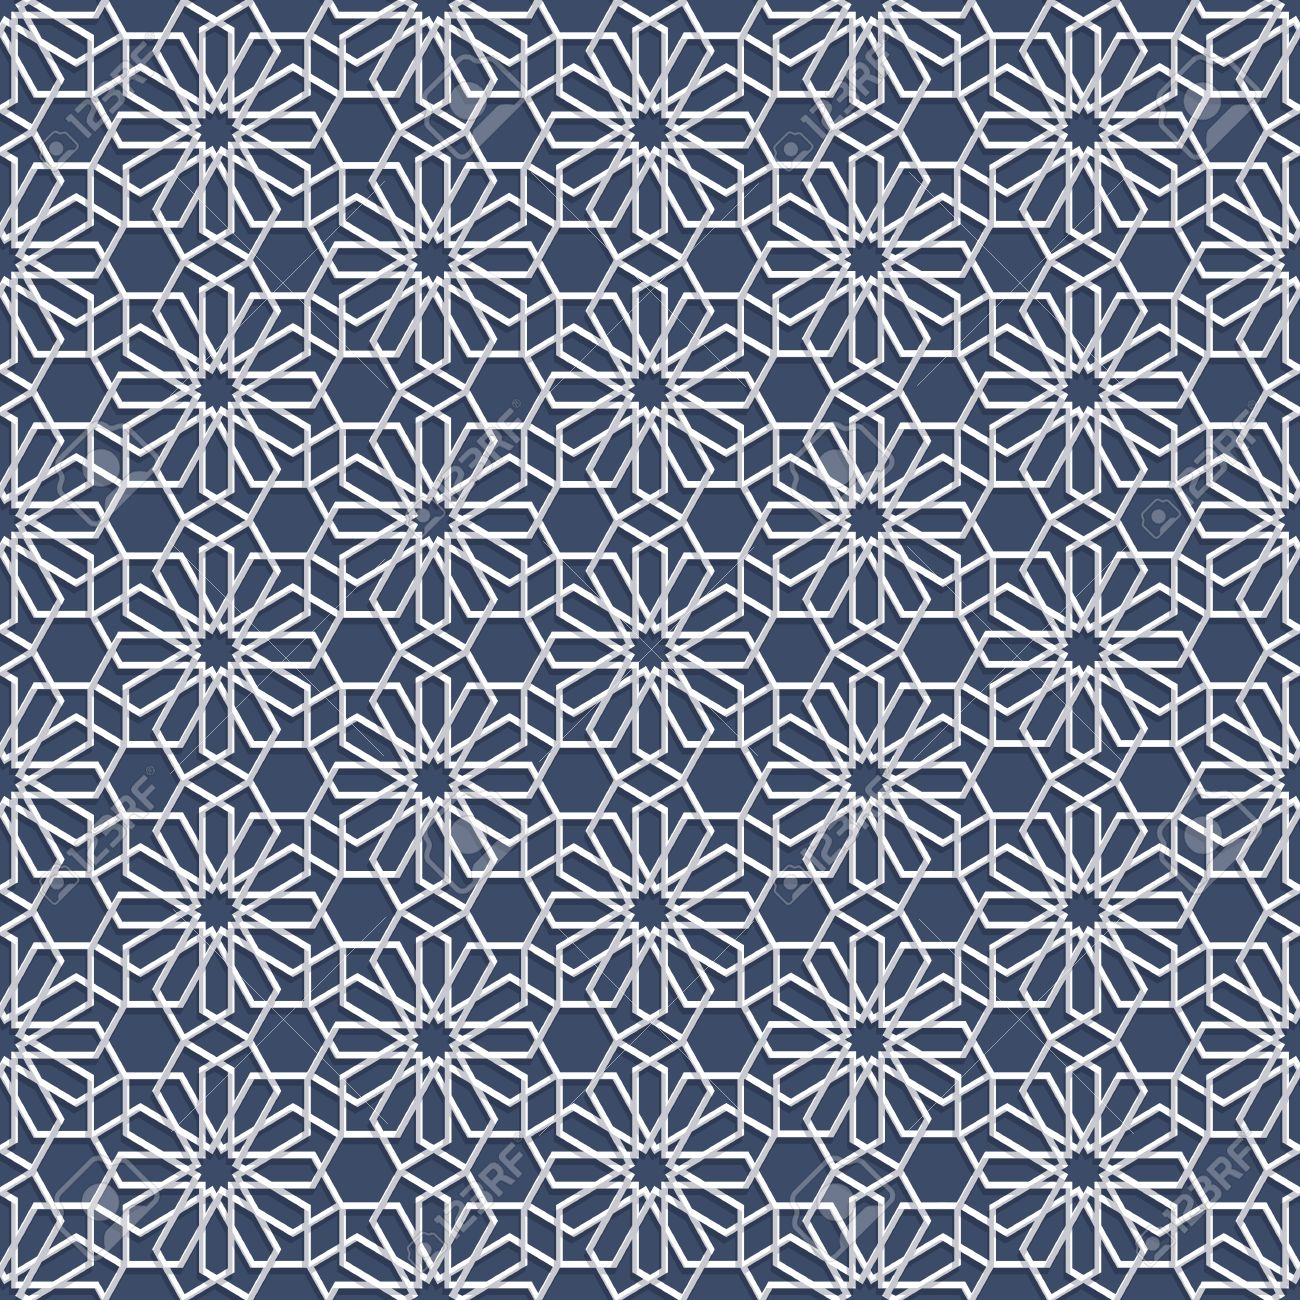 60086714 3d white seamless pattern in arabian style abstract oriental wallpaper islamic design geometric vect